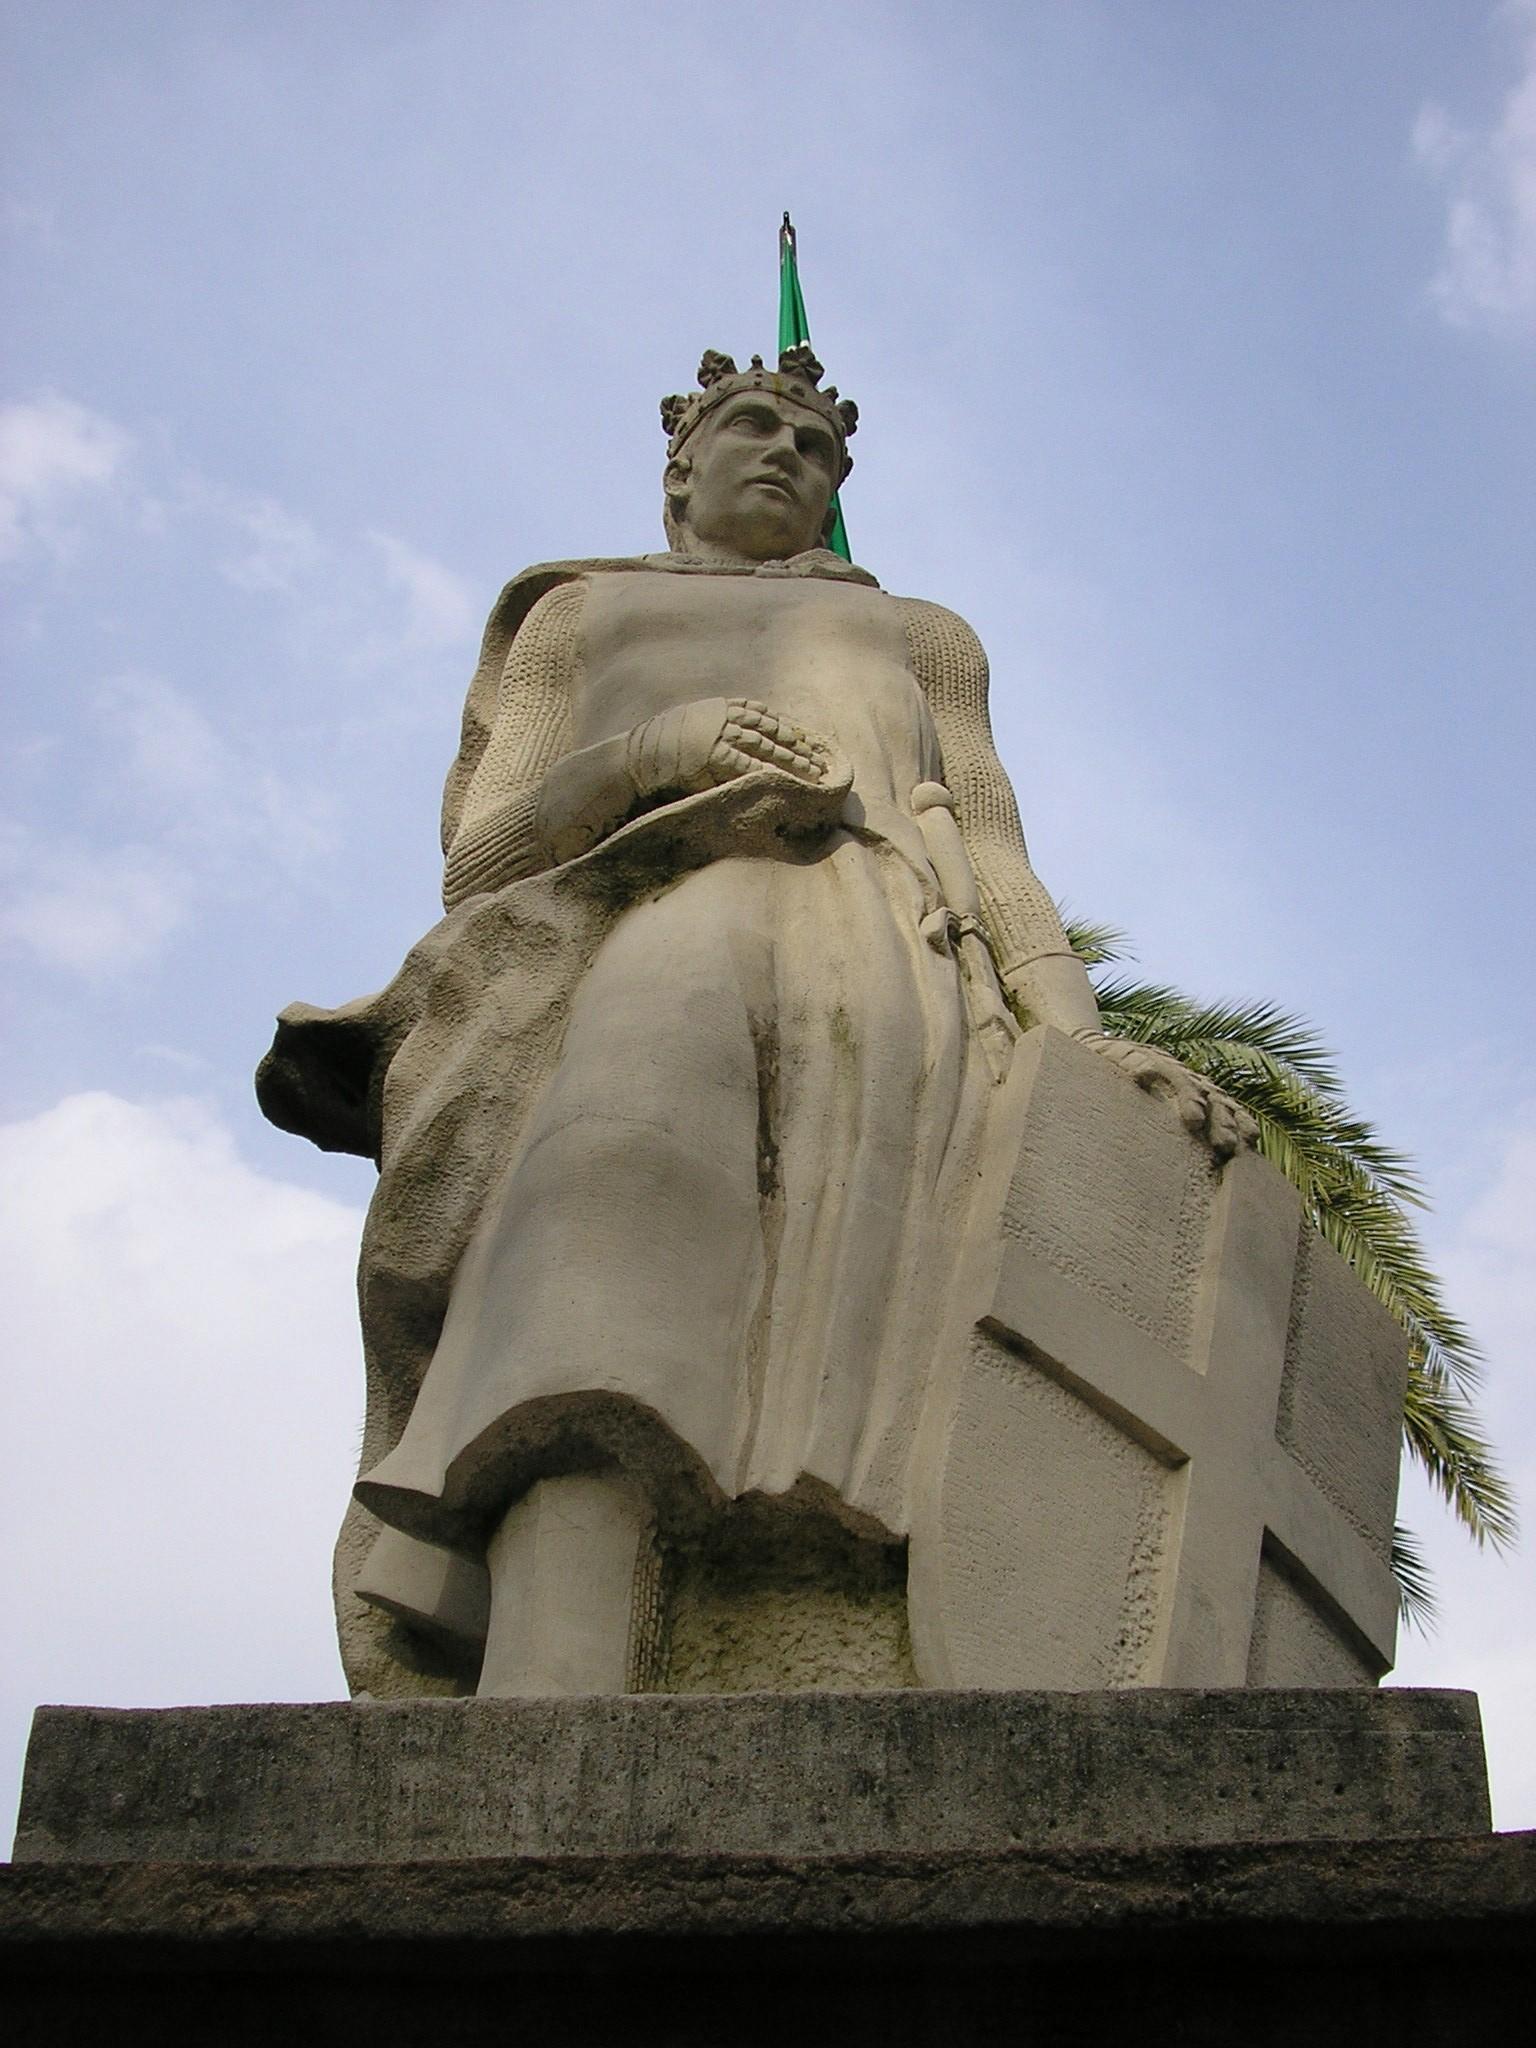 Estatua de Alfonso XI de Castilla situada en la Avenida Blas Infante de Algeciras, España